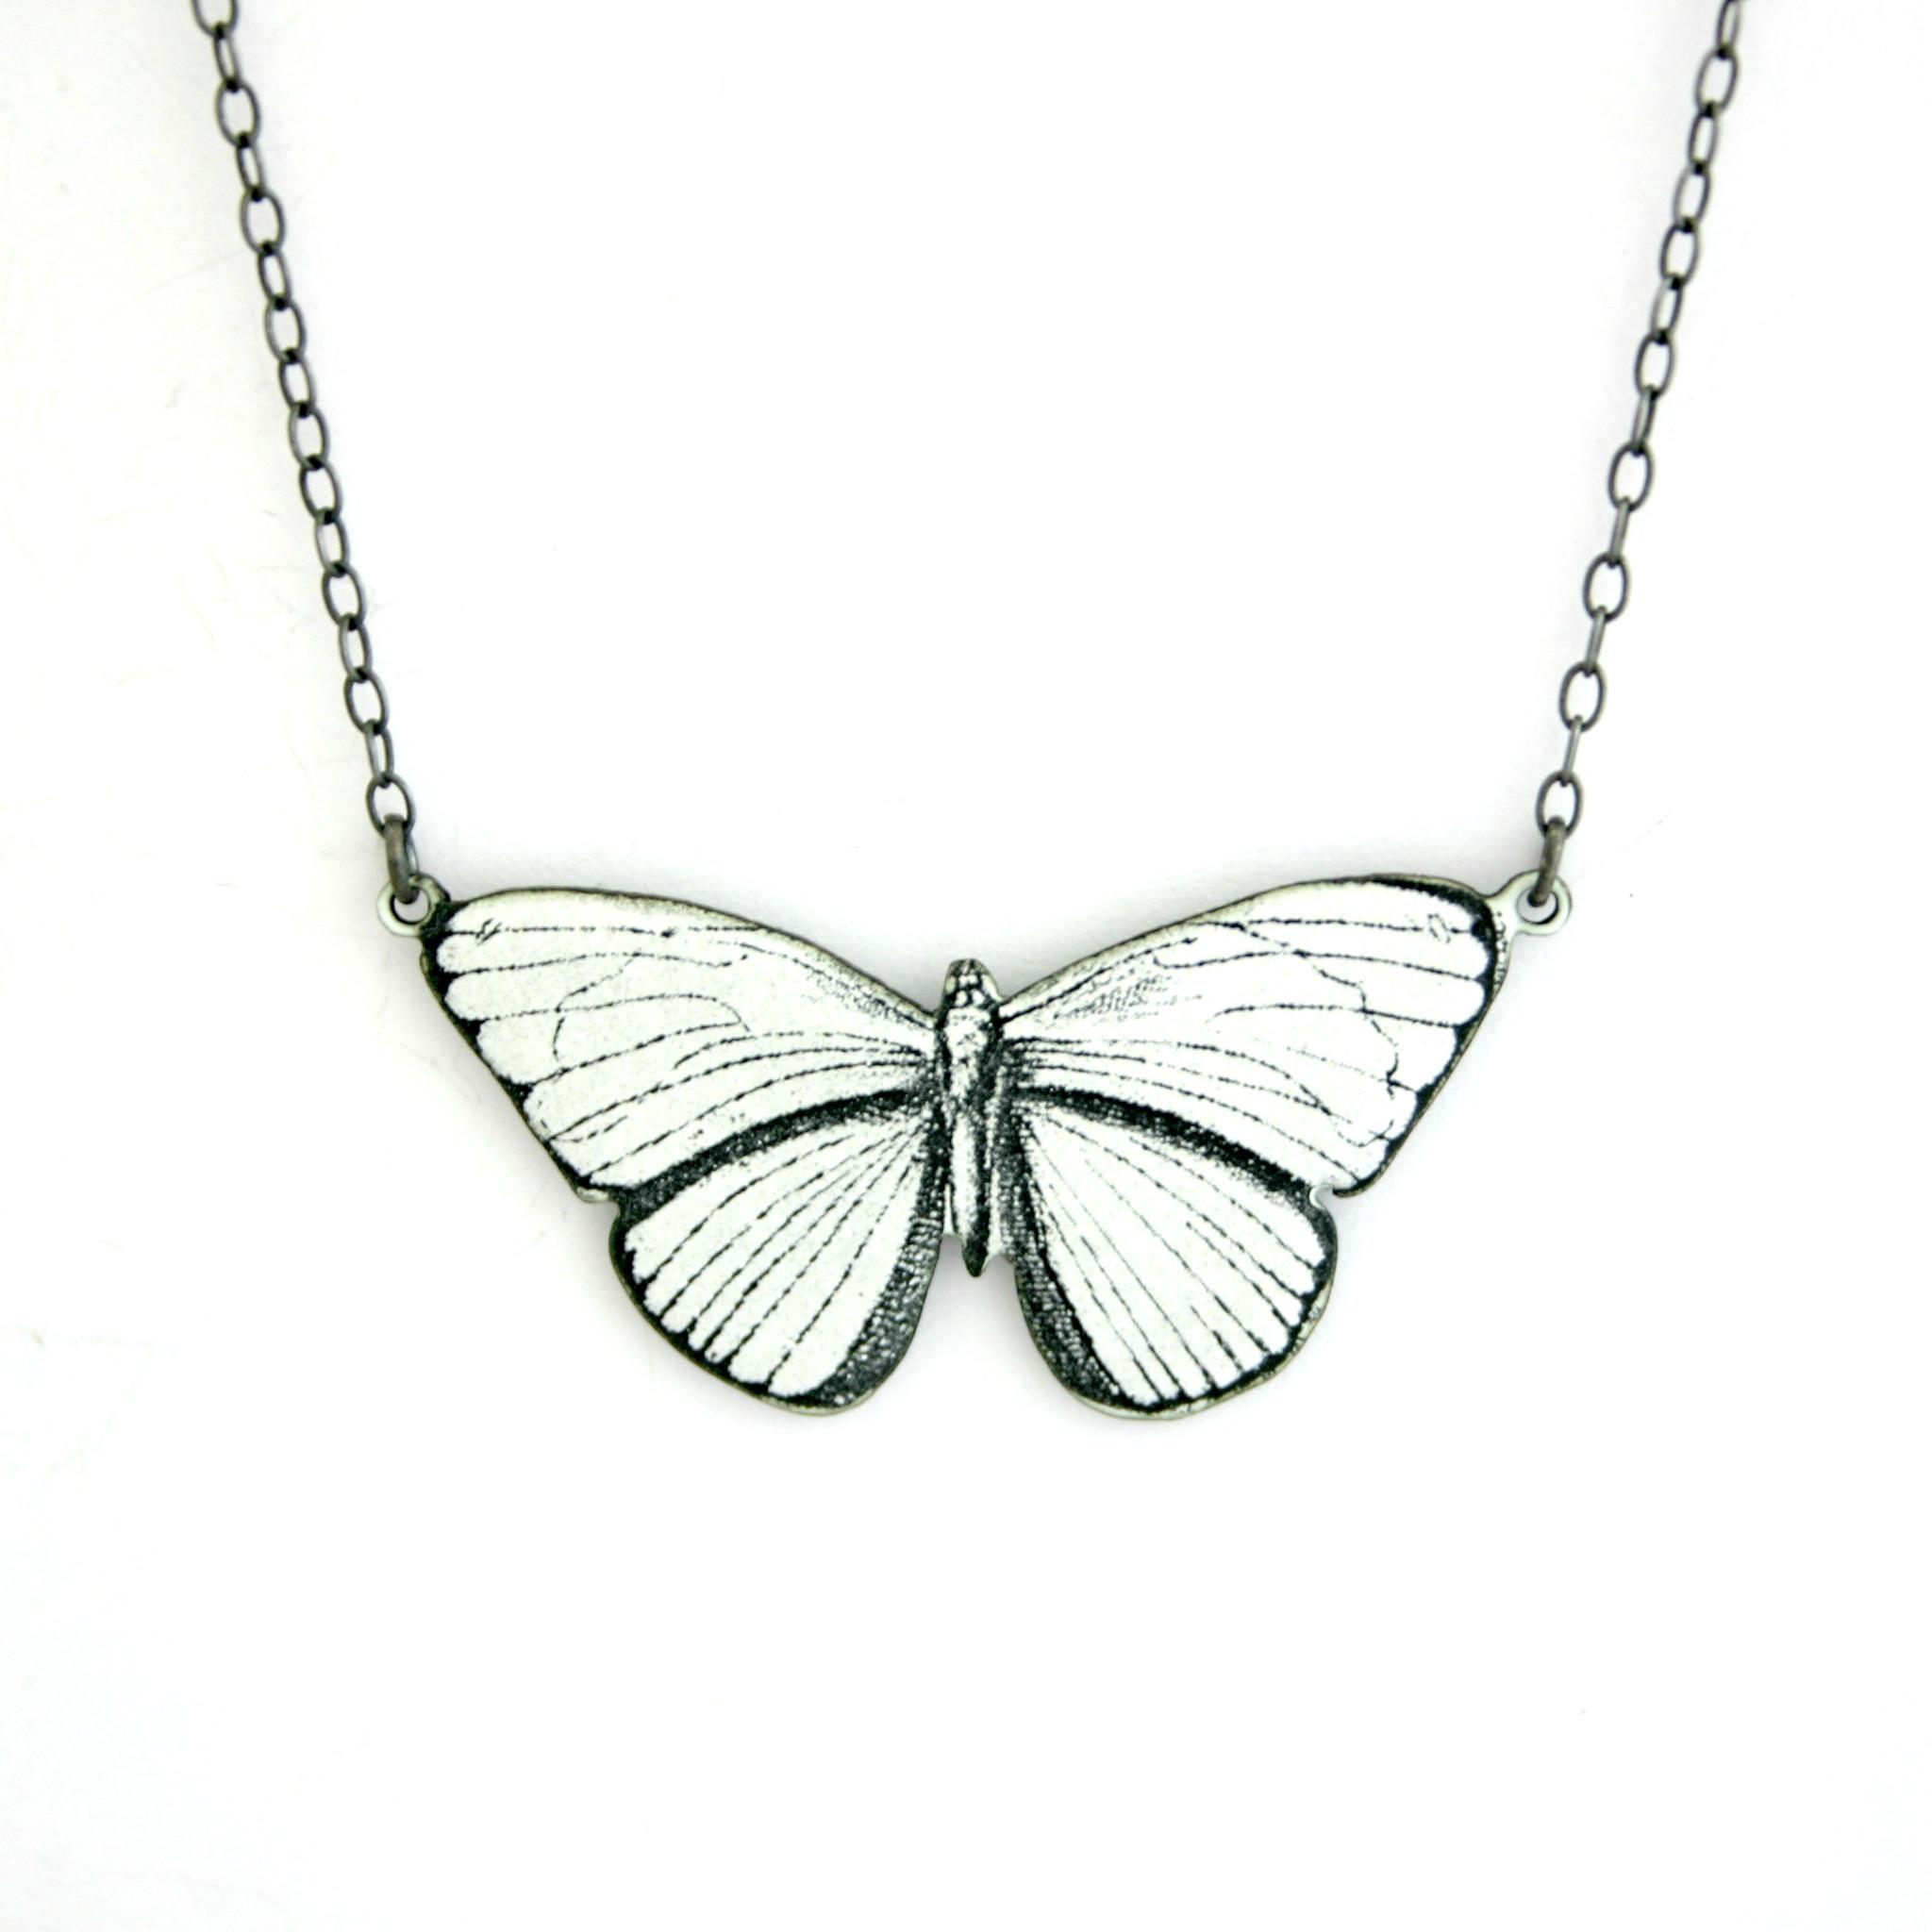 Antique Enamel Necklace White Black Contemporary